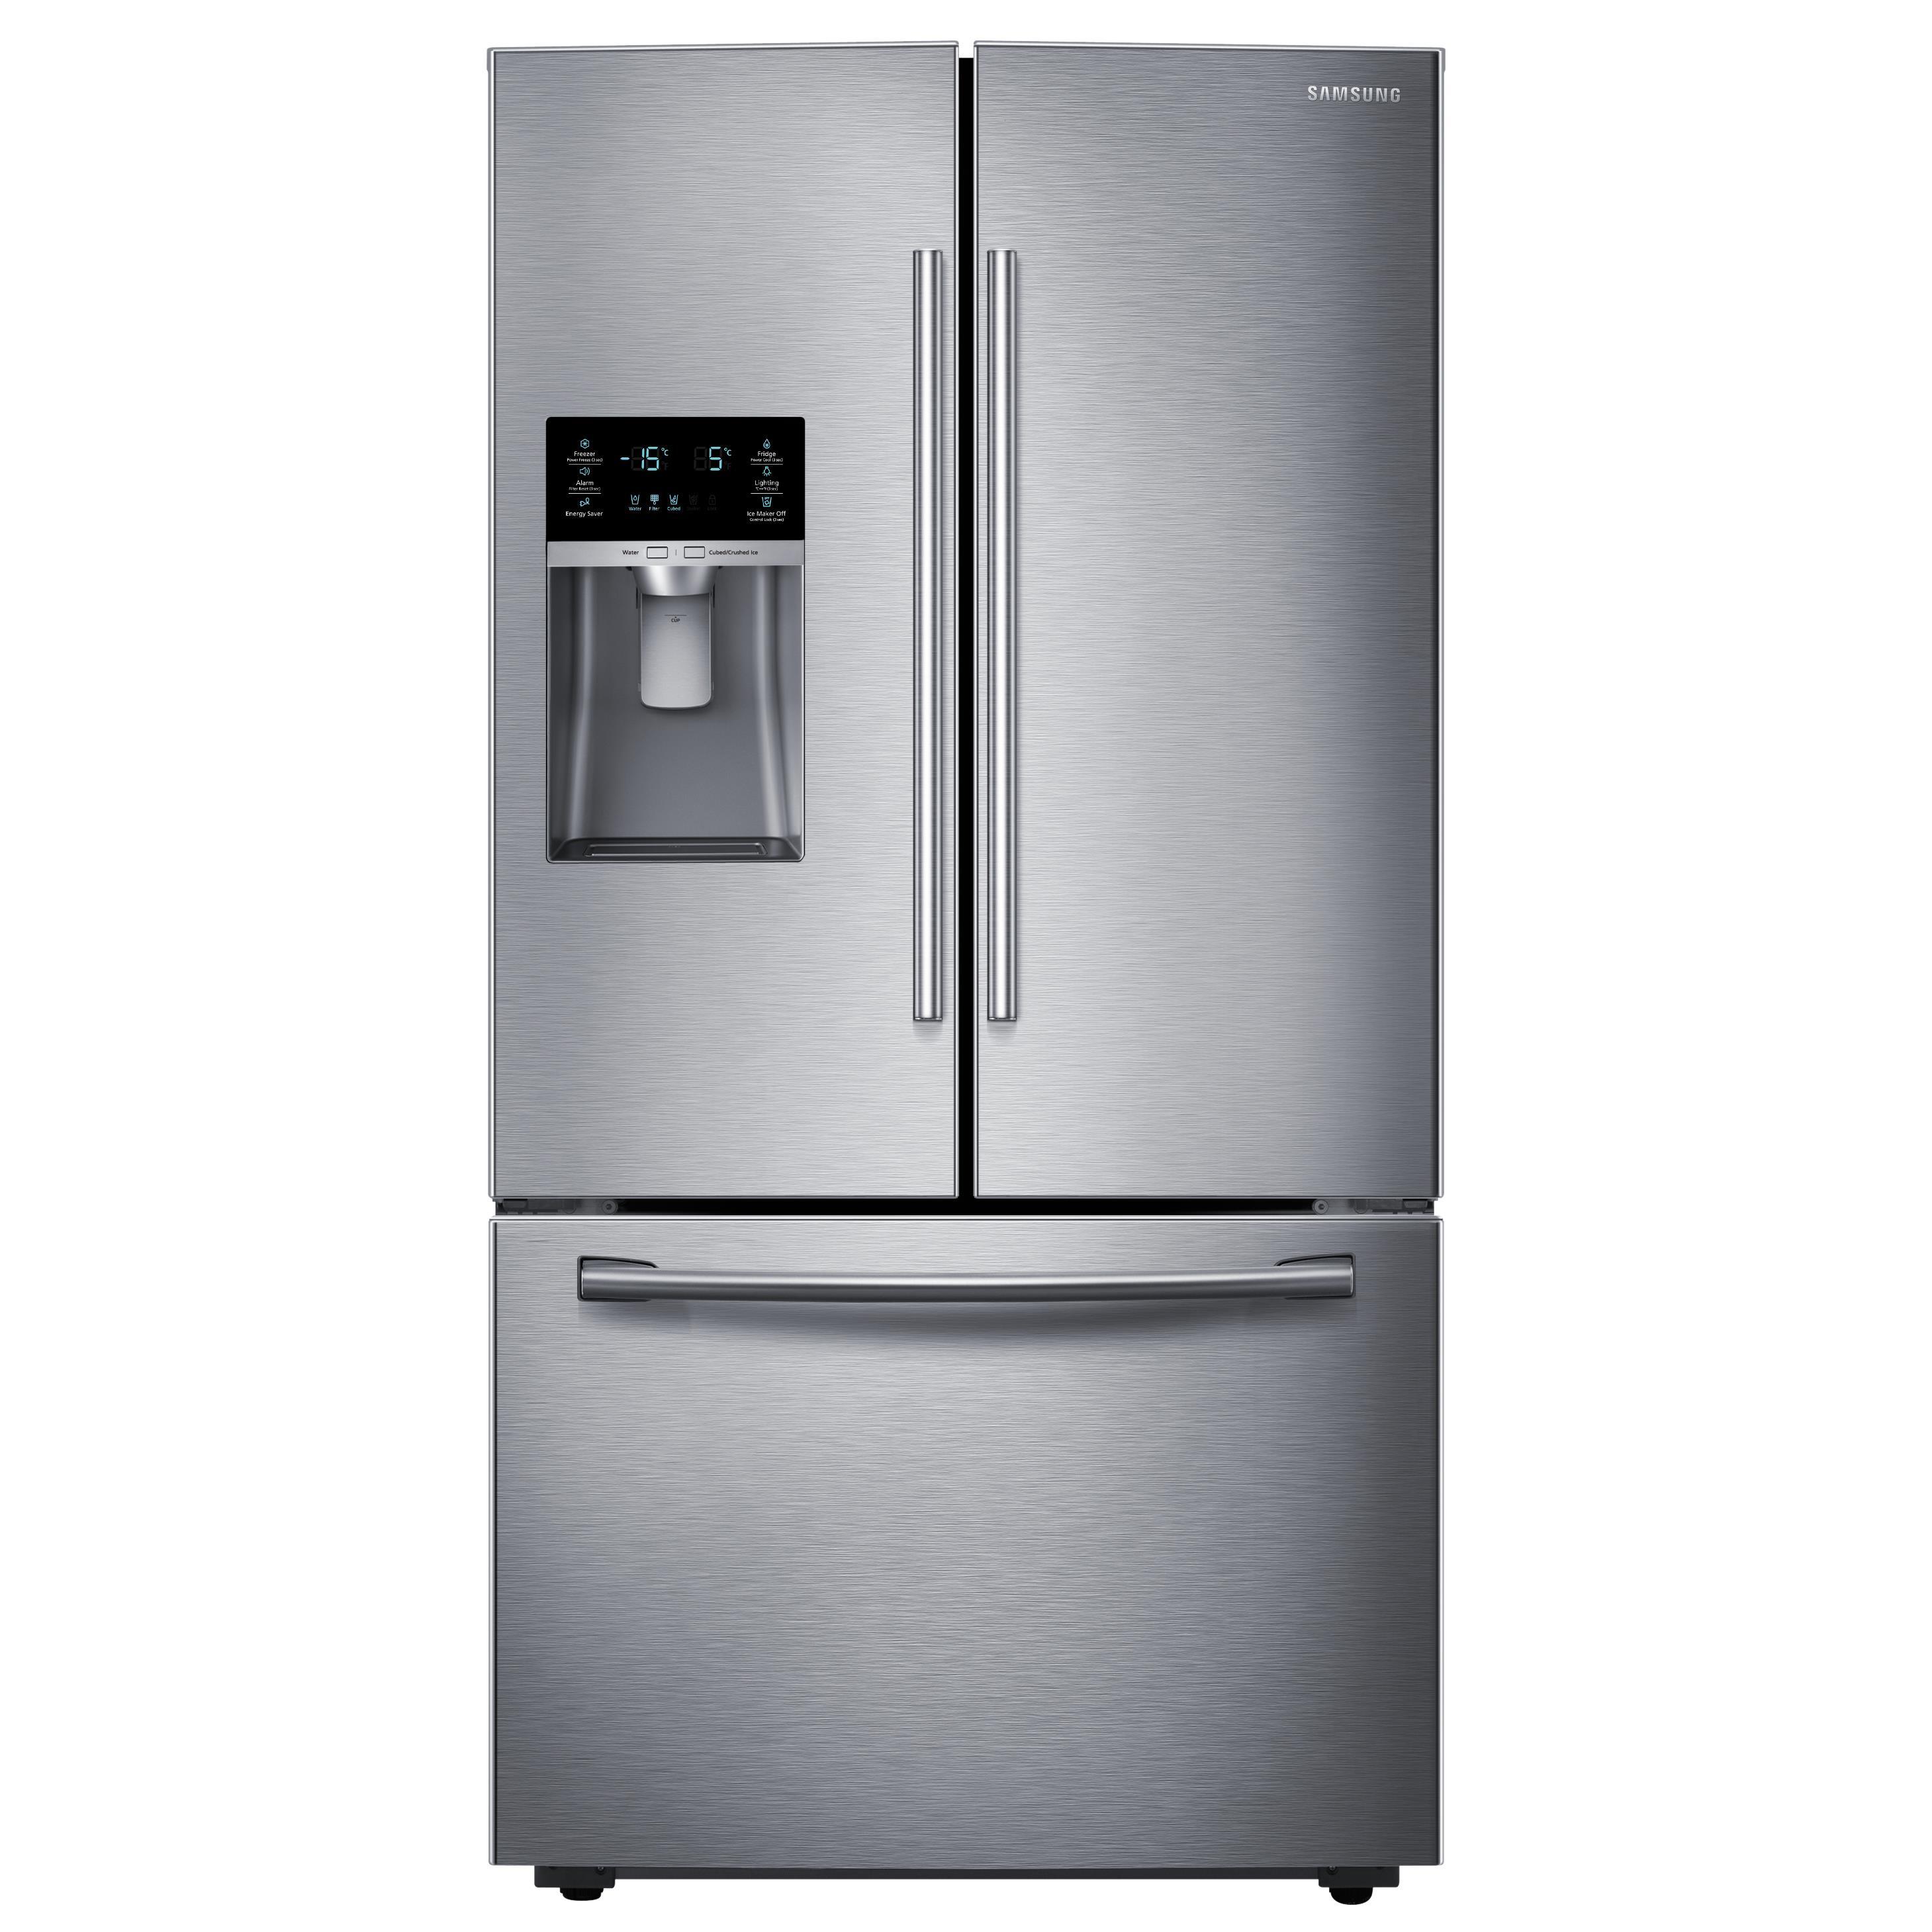 Samsung Appliances French Door Refrigerators 28 cu. ft. French Door Refrigerator - Item Number: RF28HFEDBSR